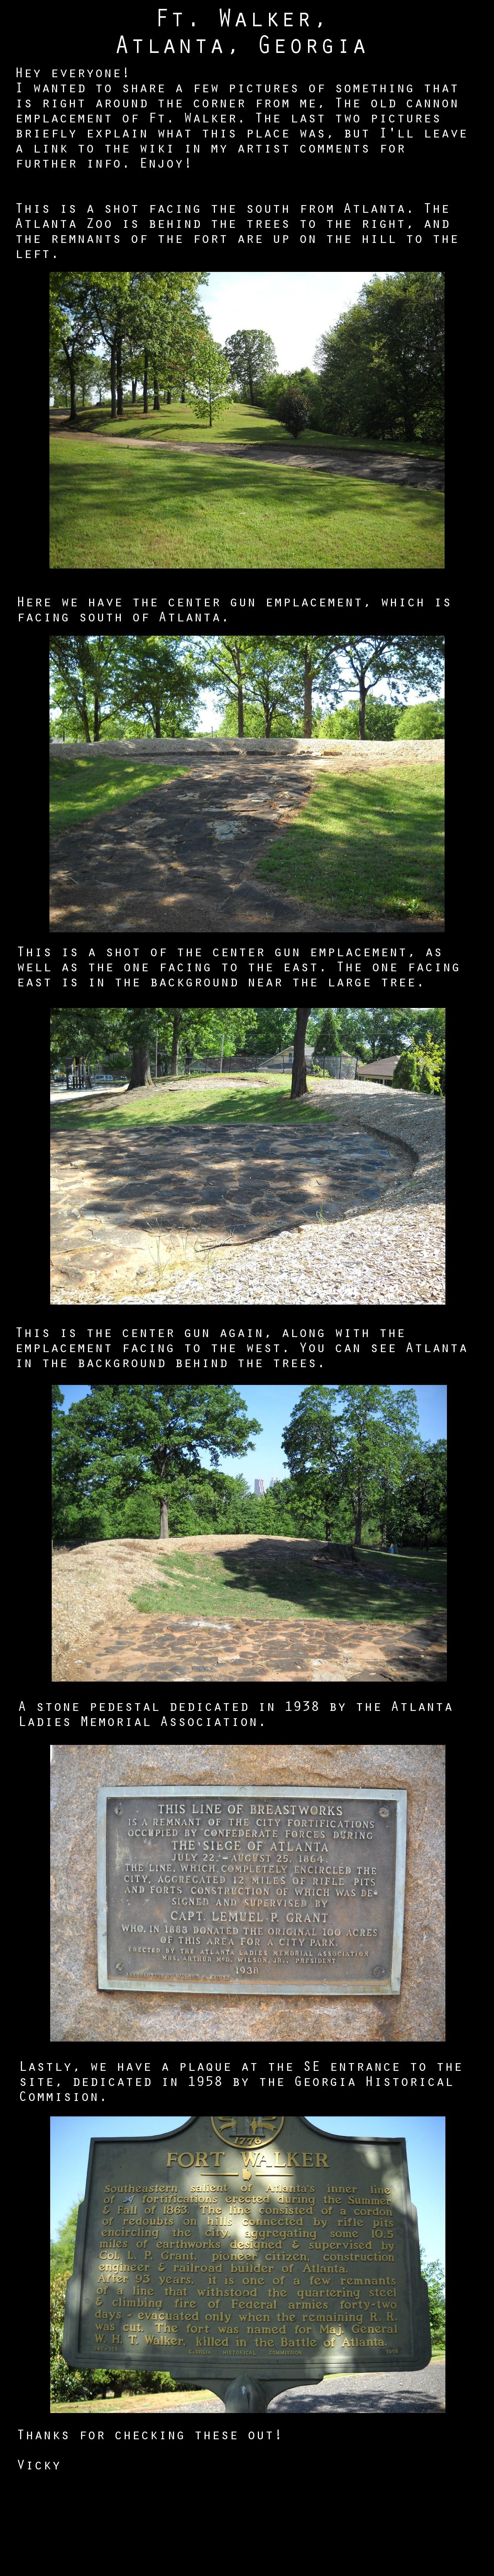 Ft. Walker, Atlanta, GA by VickyM72